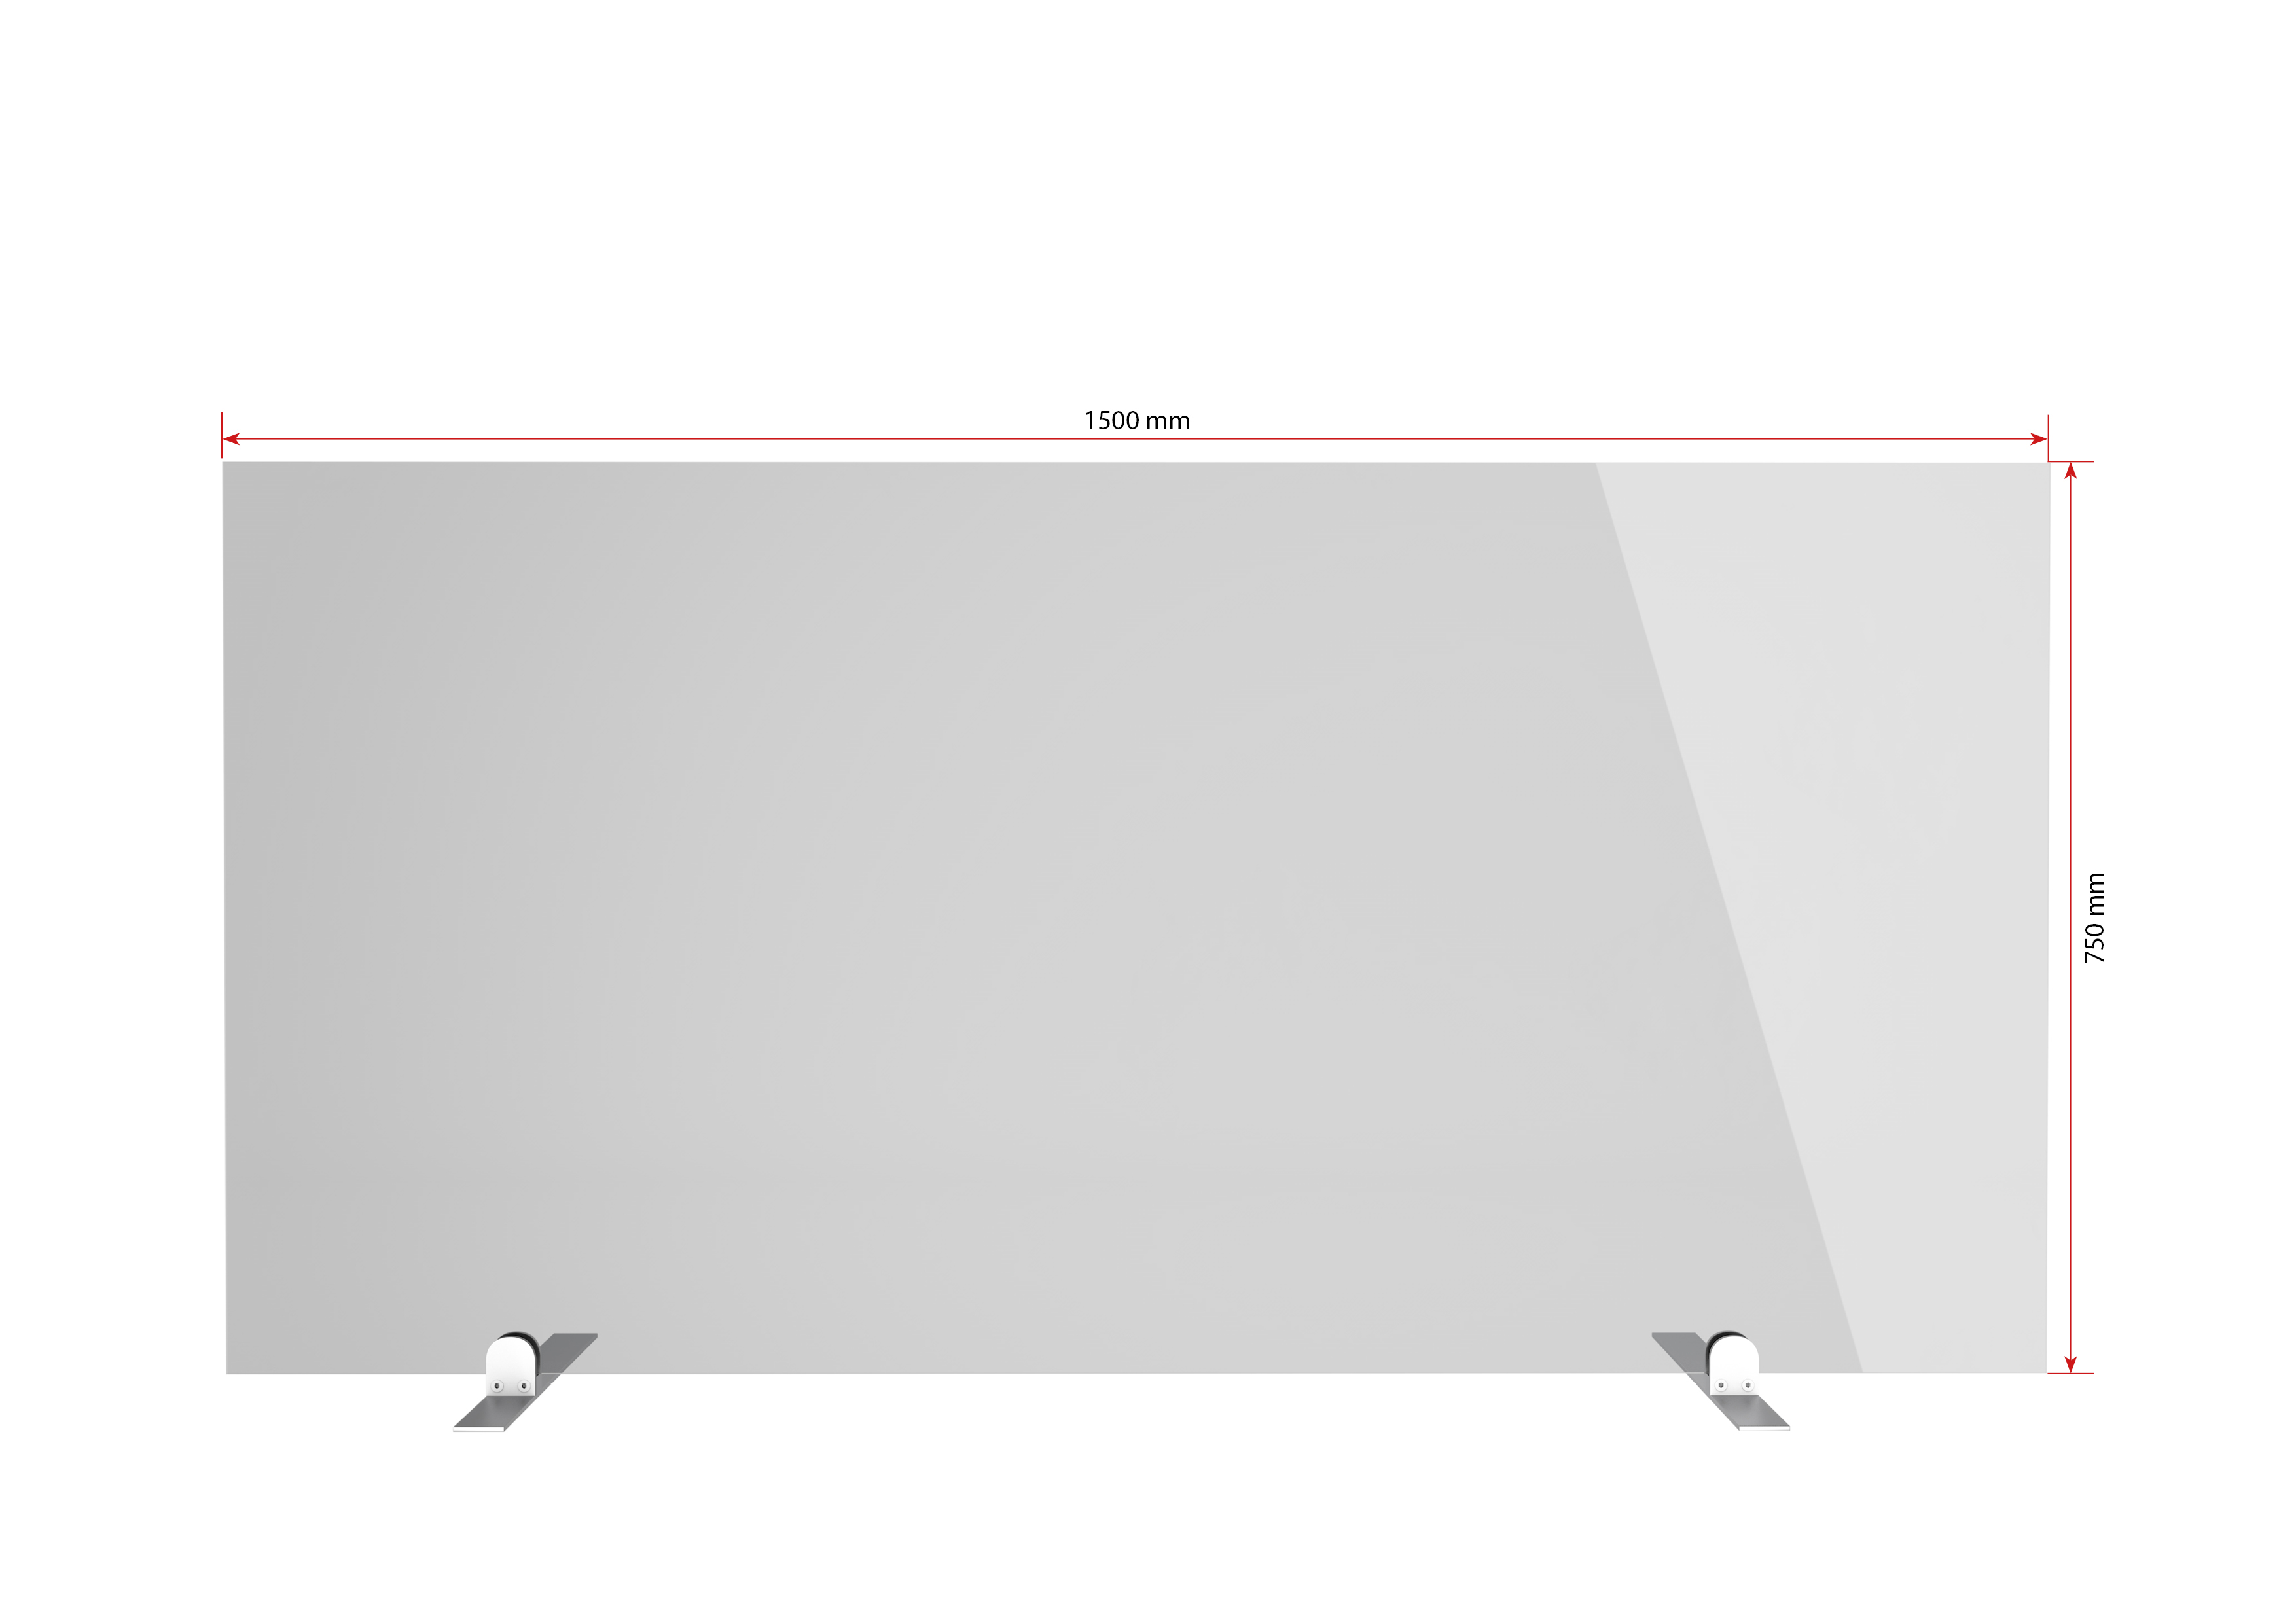 Gutta Spuckschutzwand Premium 1500 x 500 x 6 mm